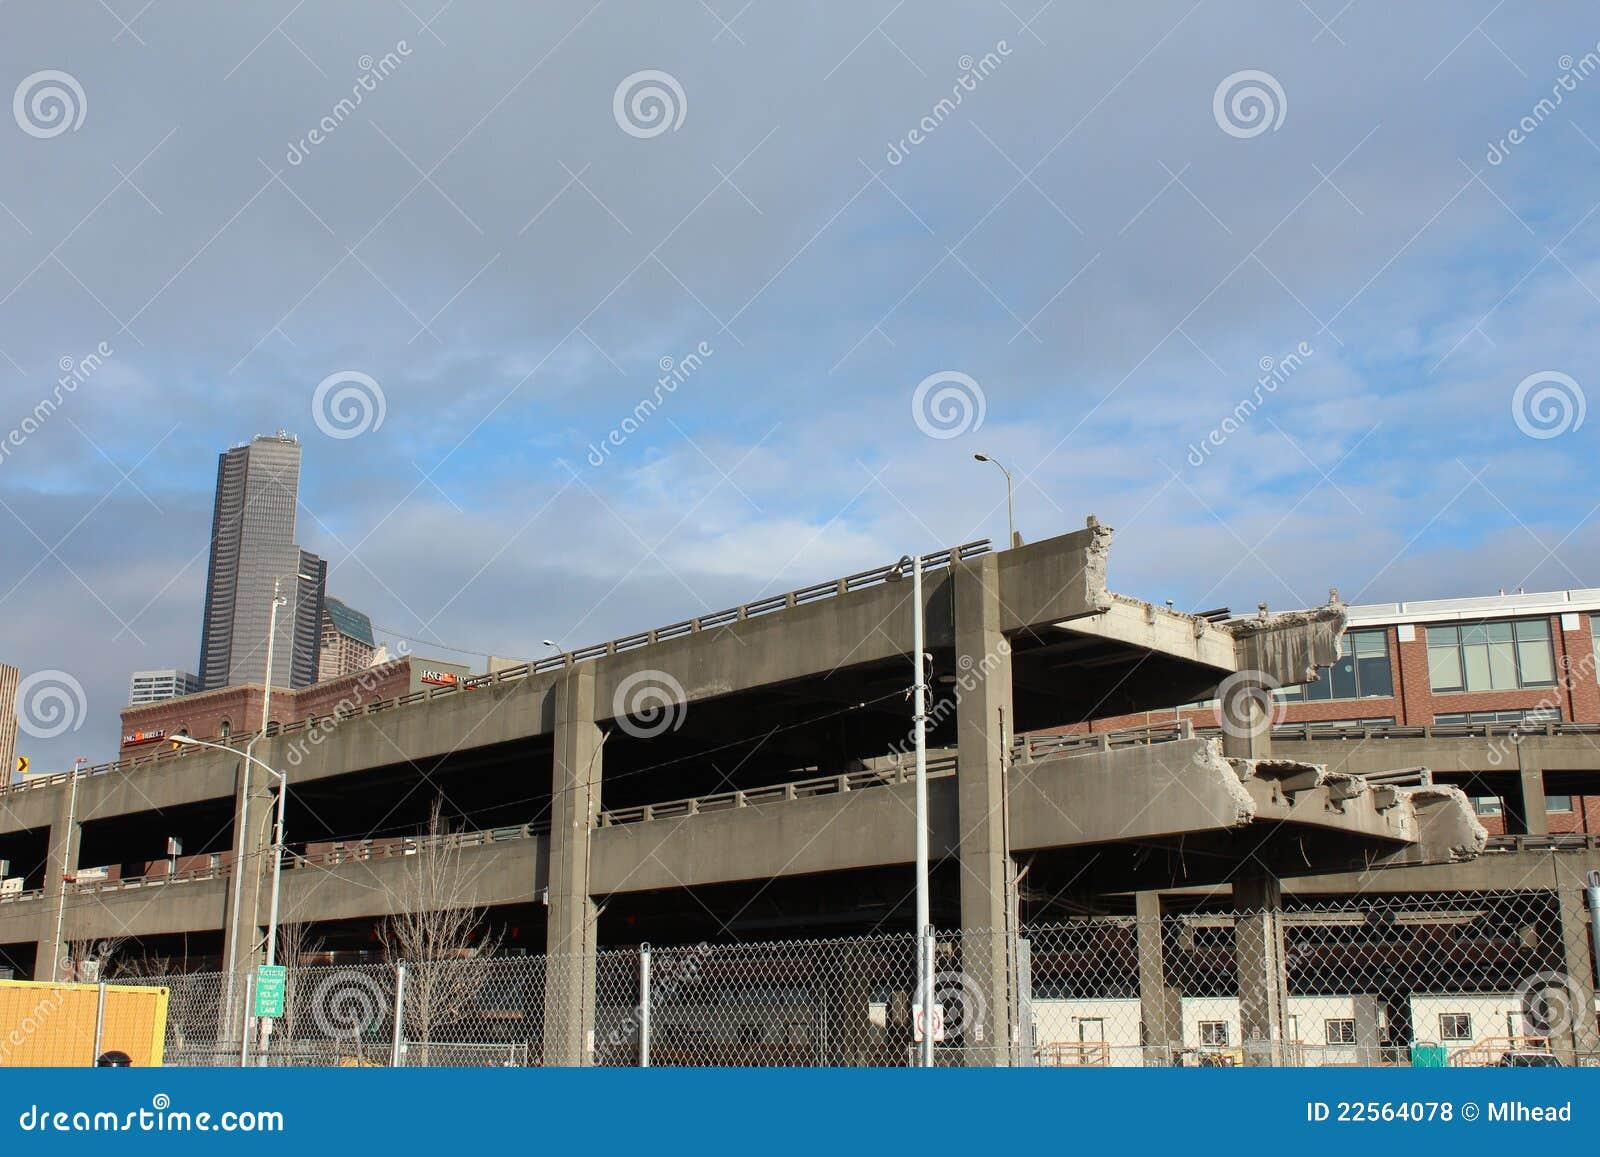 Demolition of the Alaskan Way Viaduct